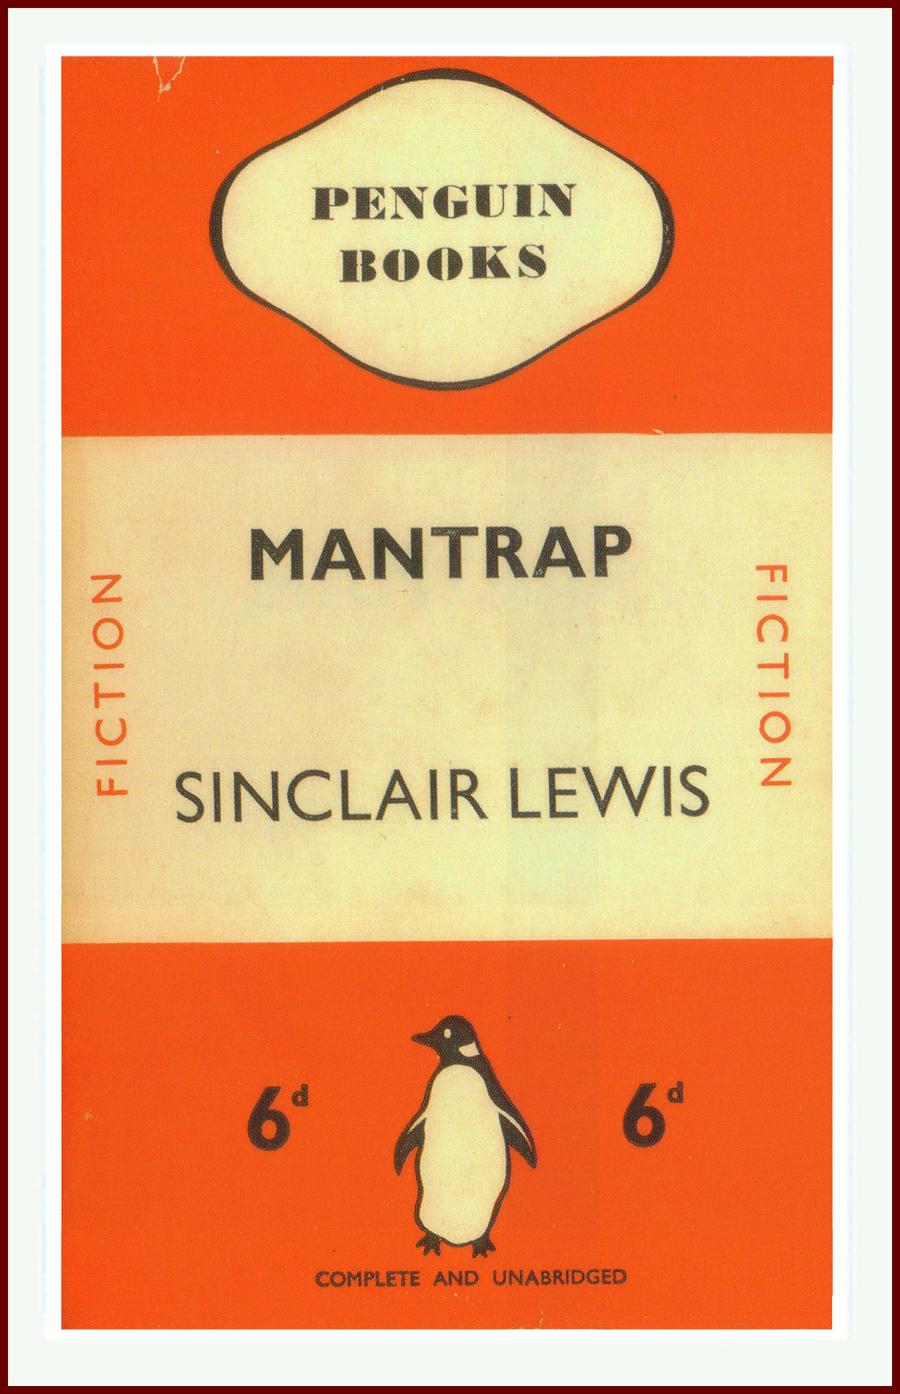 Mantrap by Sinclair Lewis